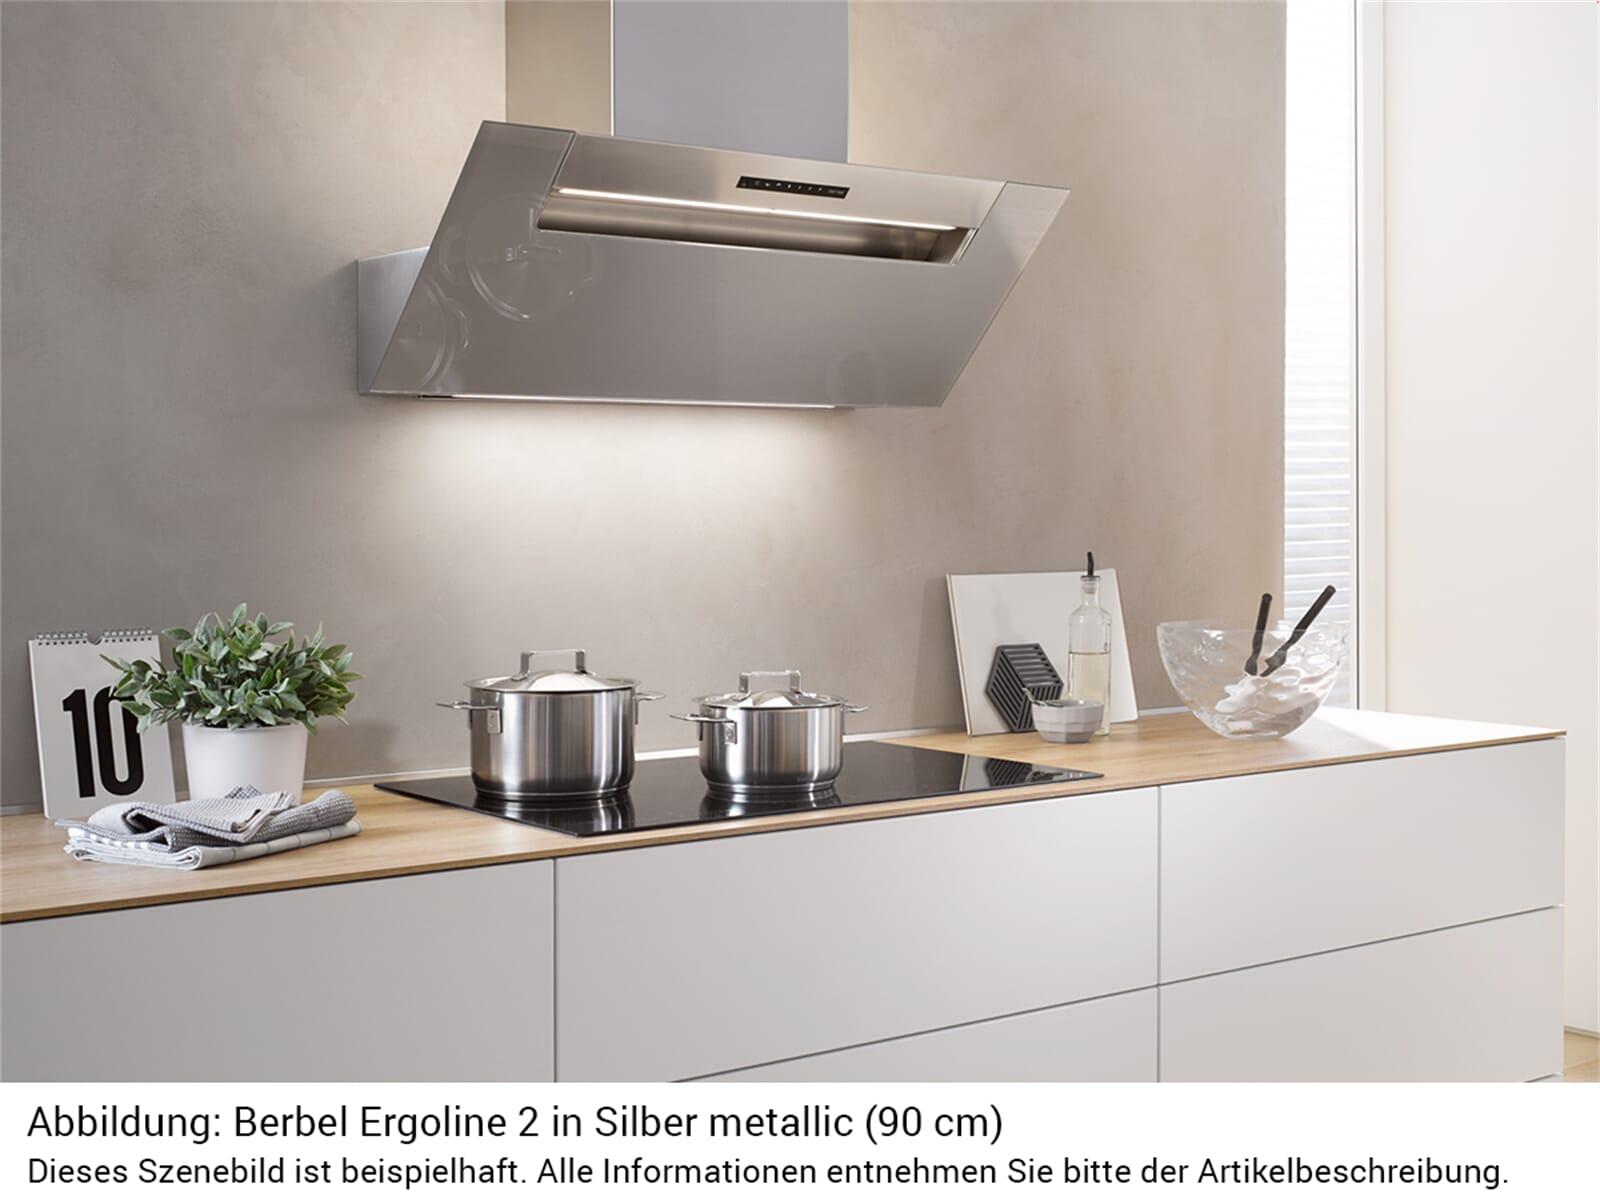 Berbel Ergoline 2 BKH 70 EG 2 Kopffreihaube Silber metallic